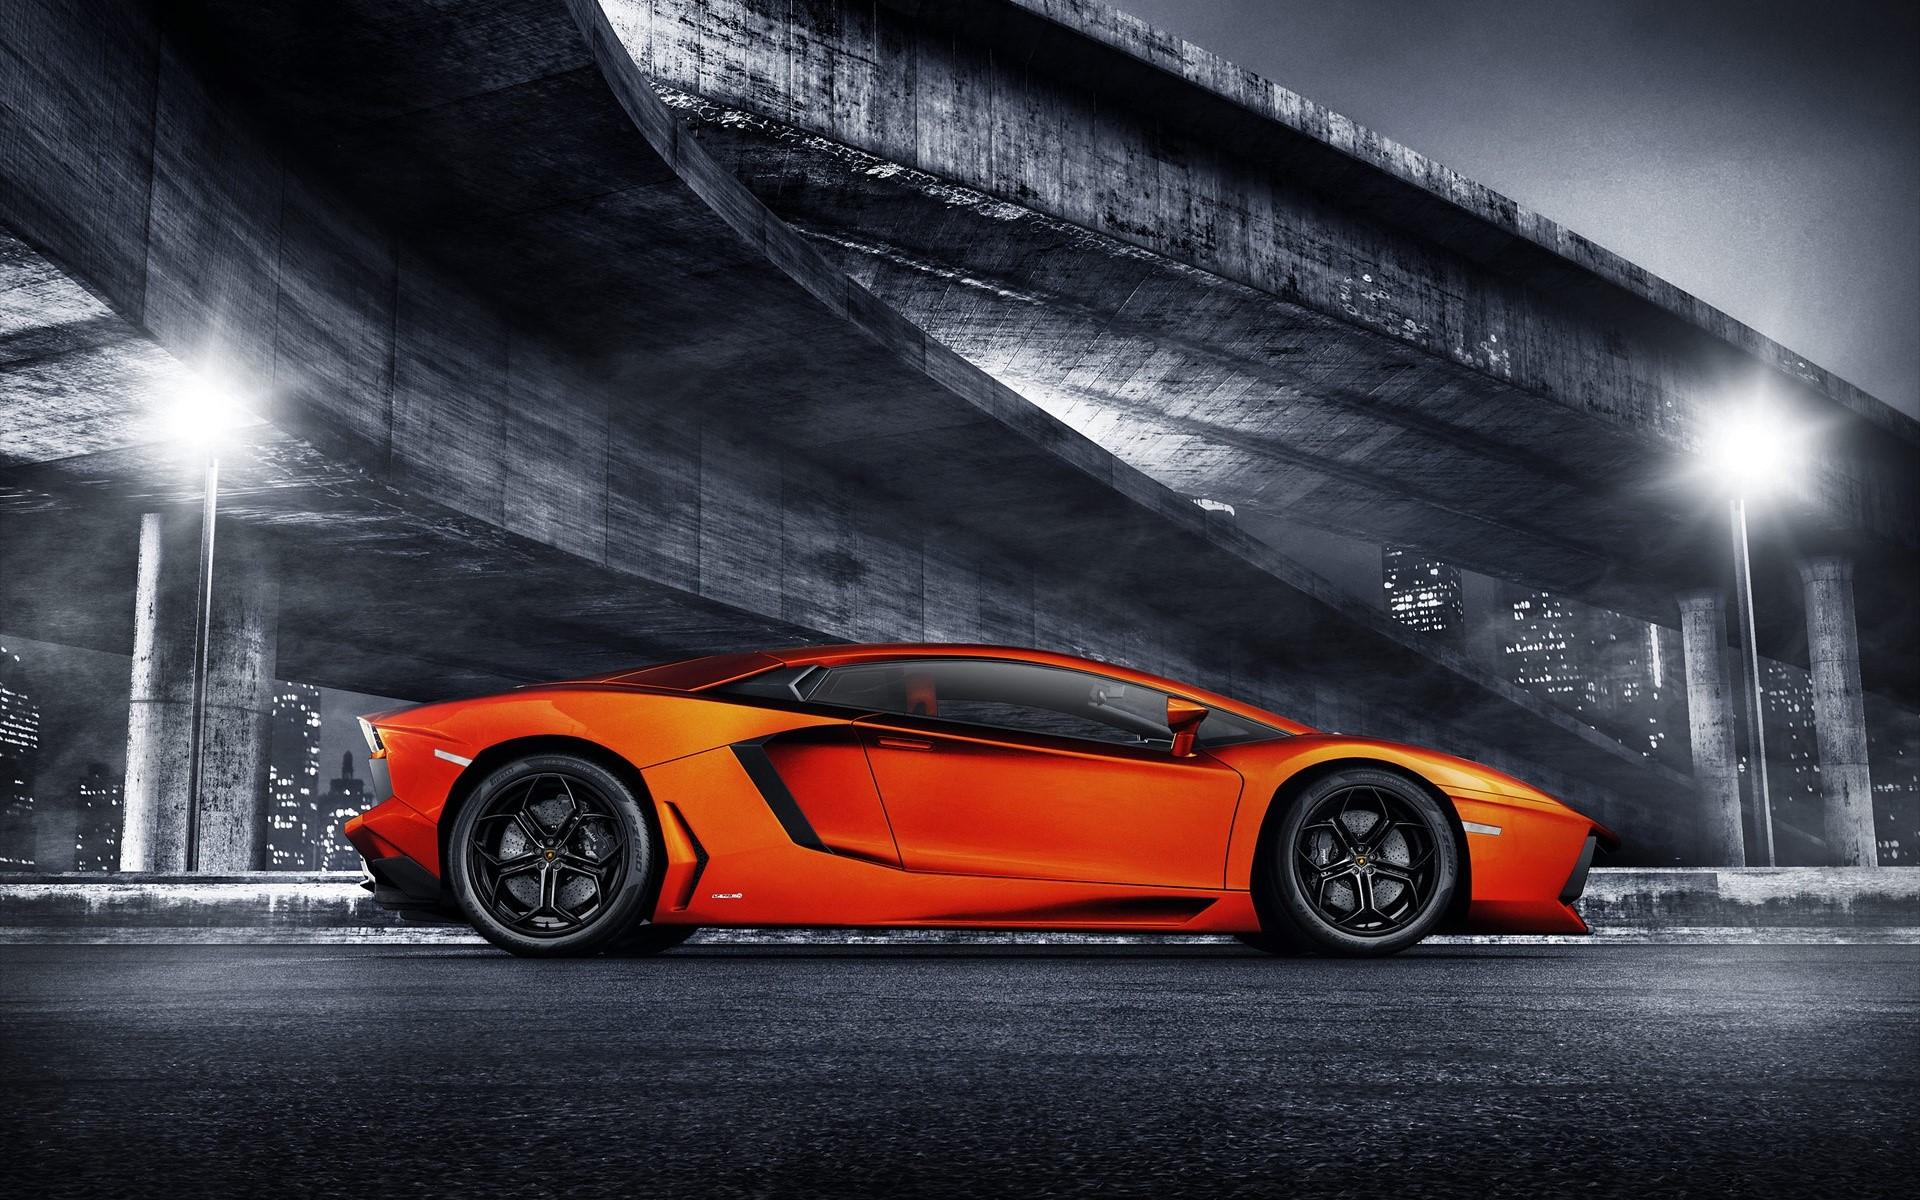 Wallpaper Lamborghini Aventador Sports Images